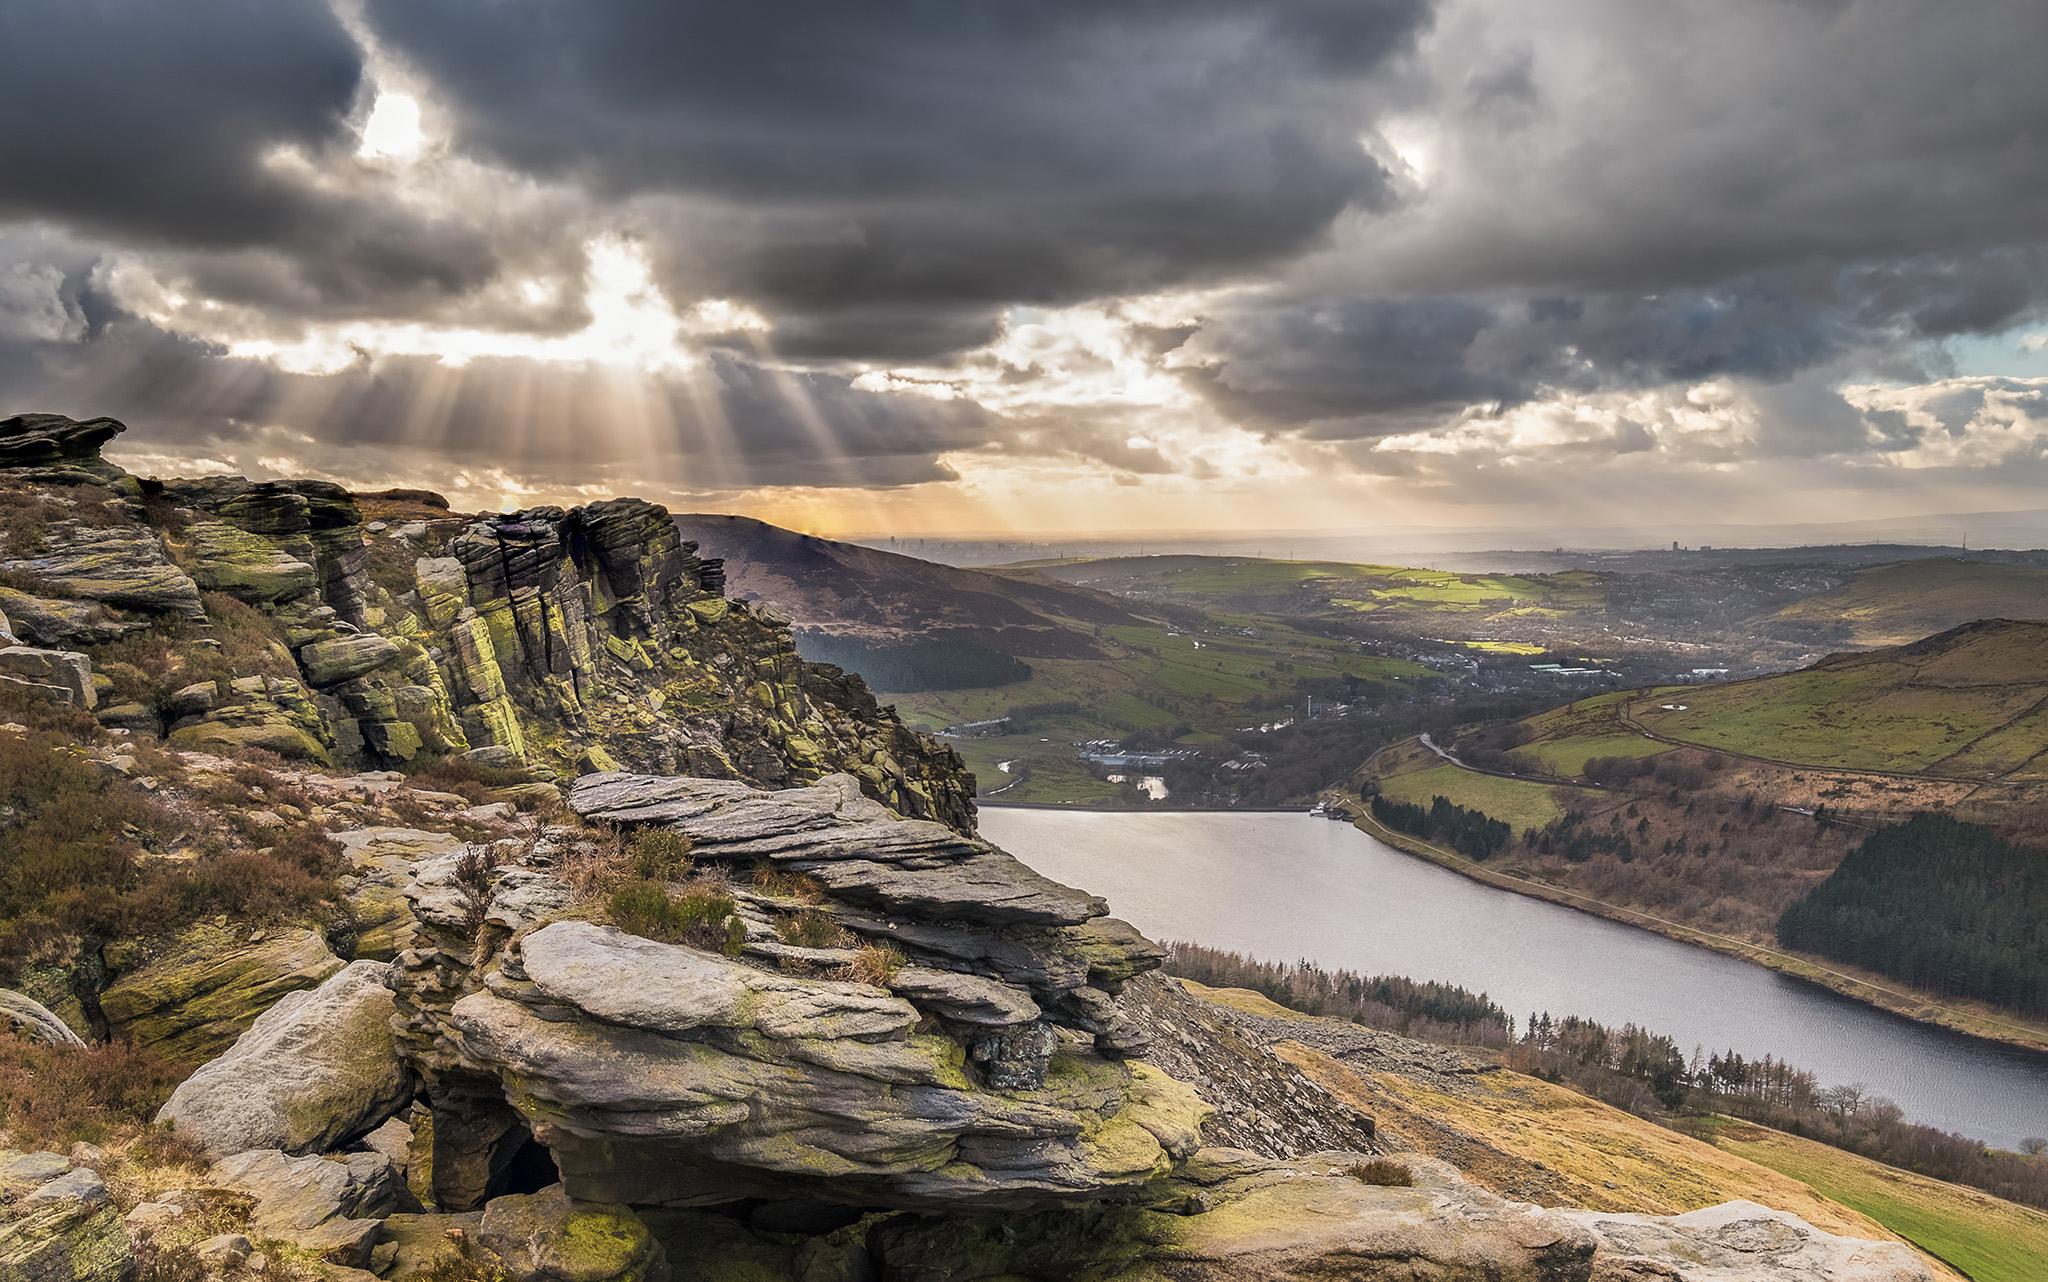 Sunset at Dean Rocks in the Peak District, United Kingdom